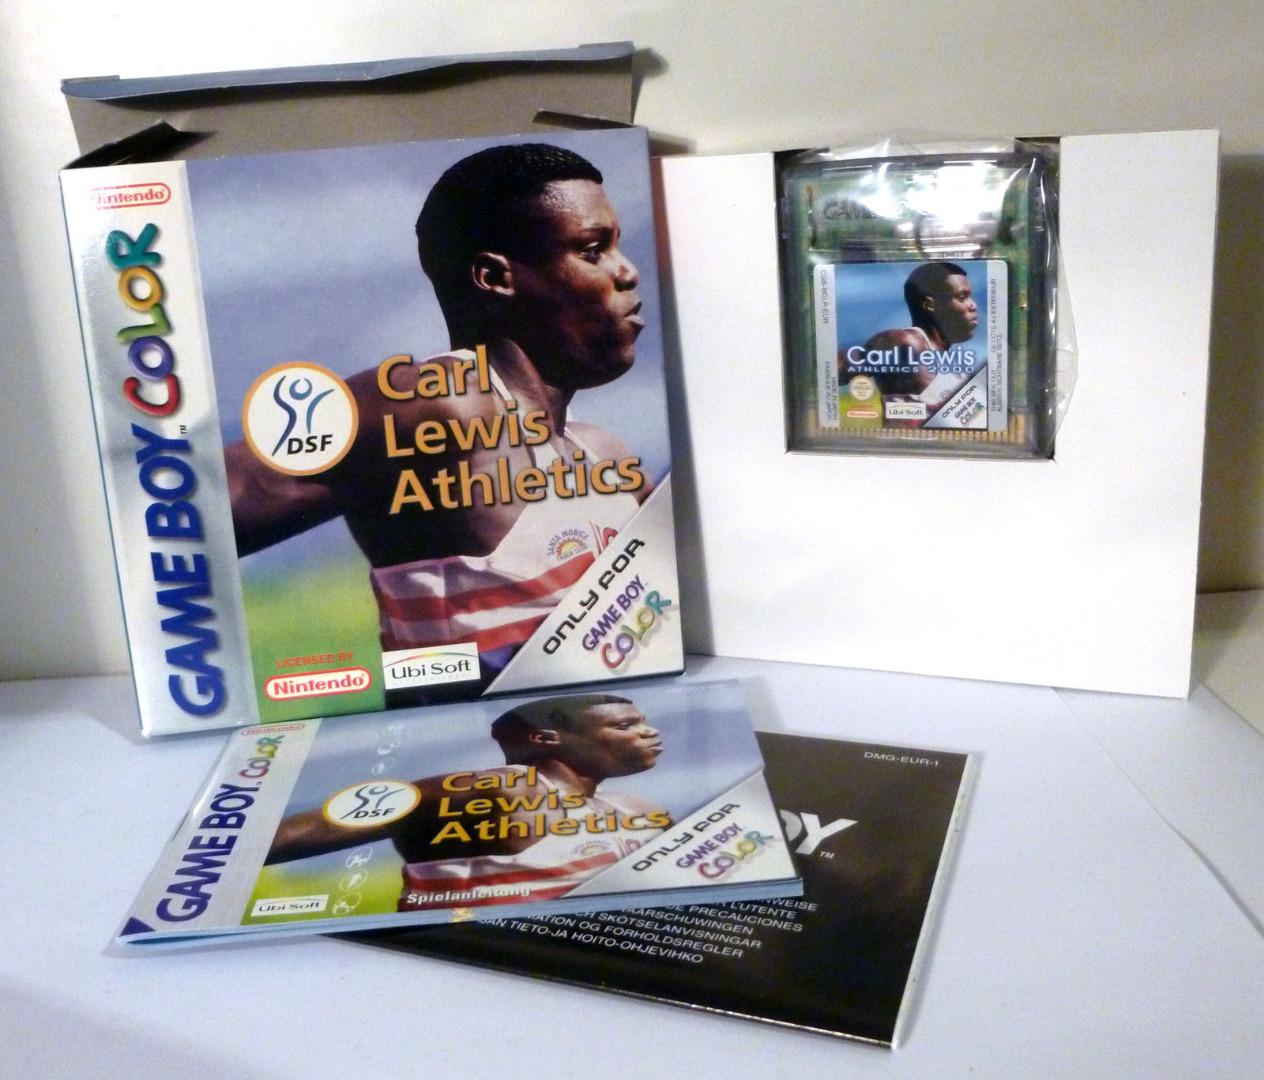 Carl Lewis Athletics - Game Boy Color - 2